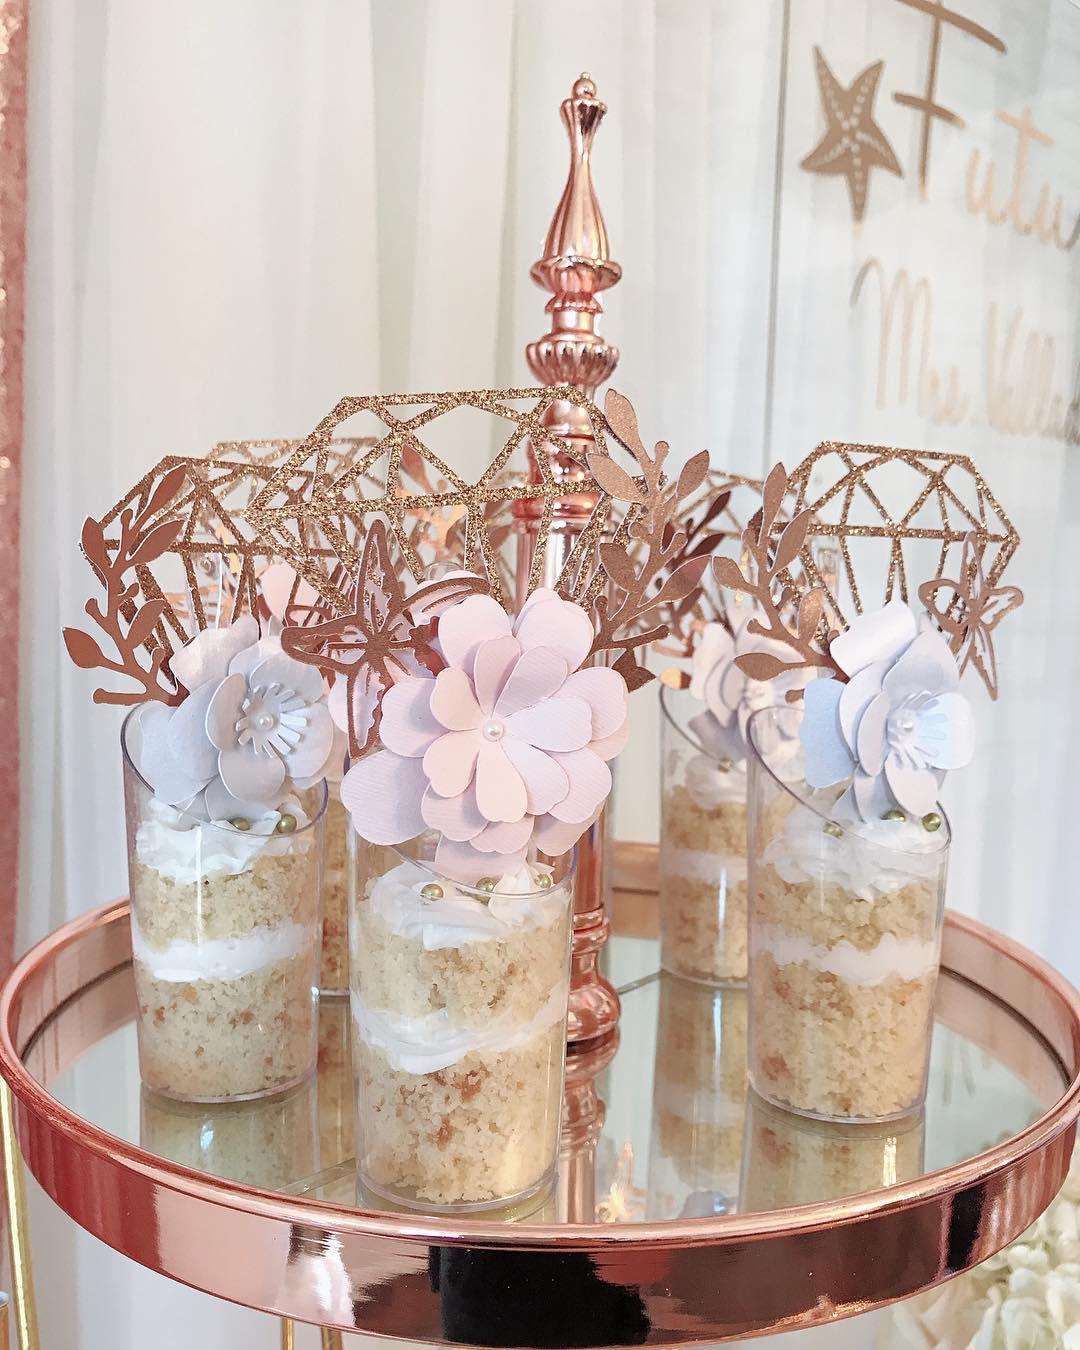 opulent treasures rose gold dessert stand sweet elegance desserts.jpg